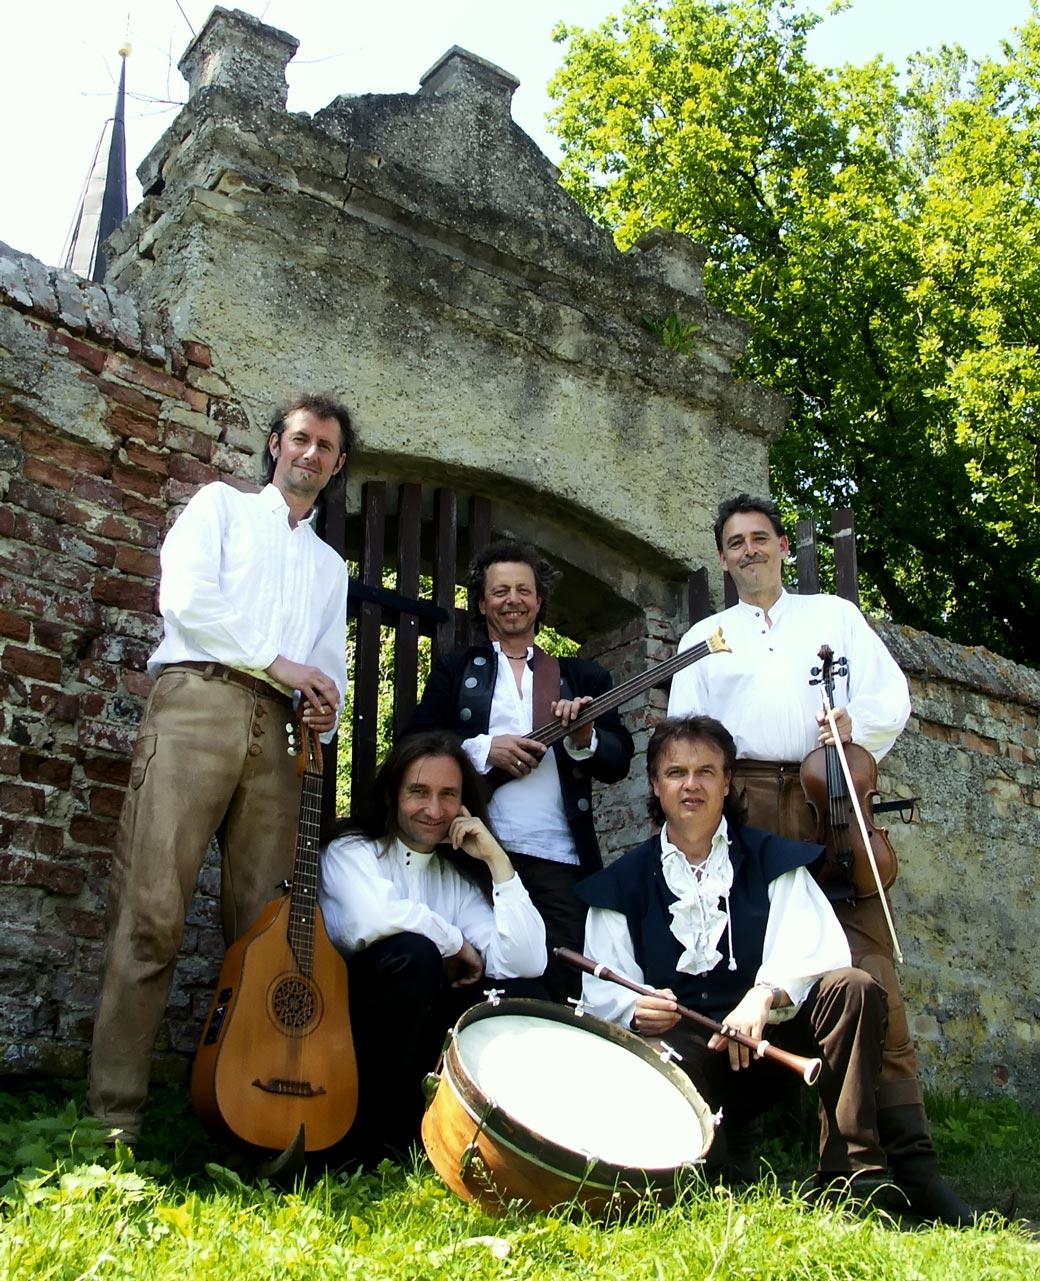 Gruppe Horch - Renaissance-Folkrock - Barock'n'Roll - Pop Art des Mittelalters